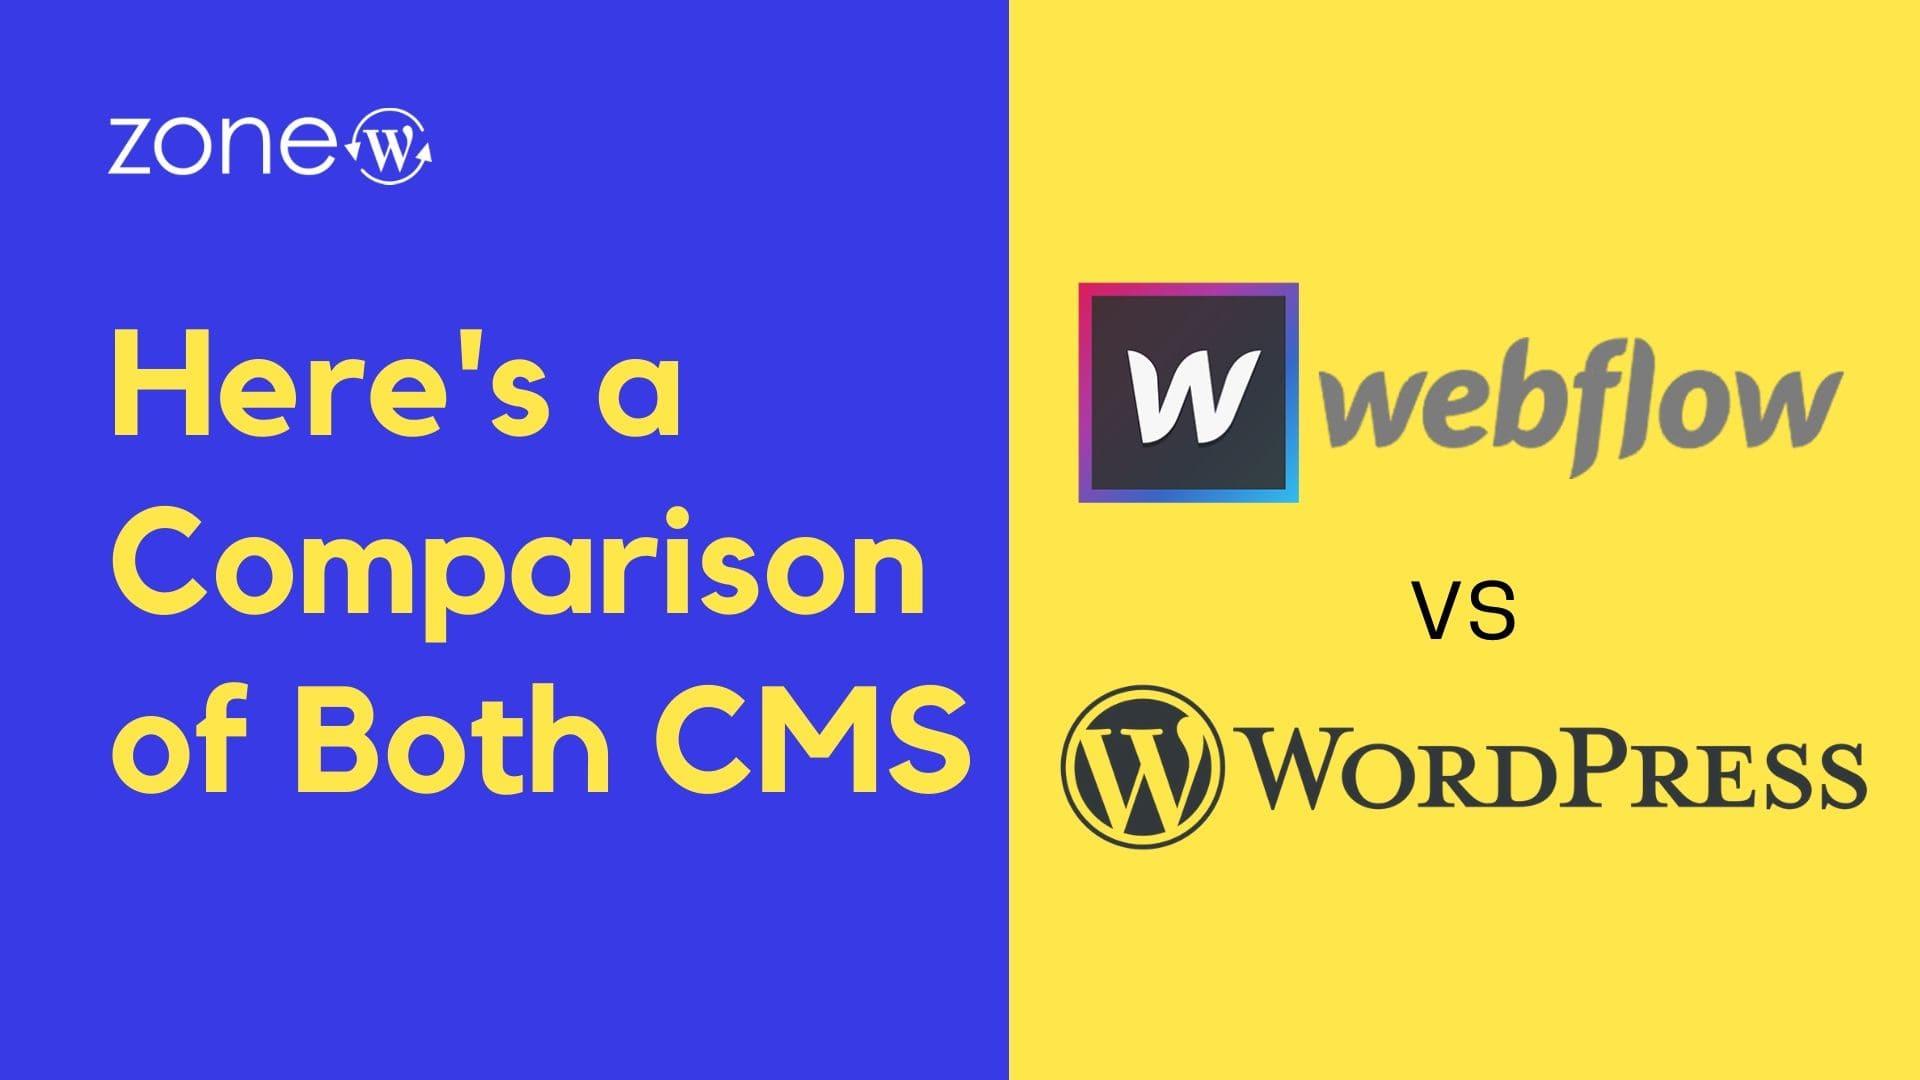 Webflow vs WordPress: Here's a Comparison of Both CMS